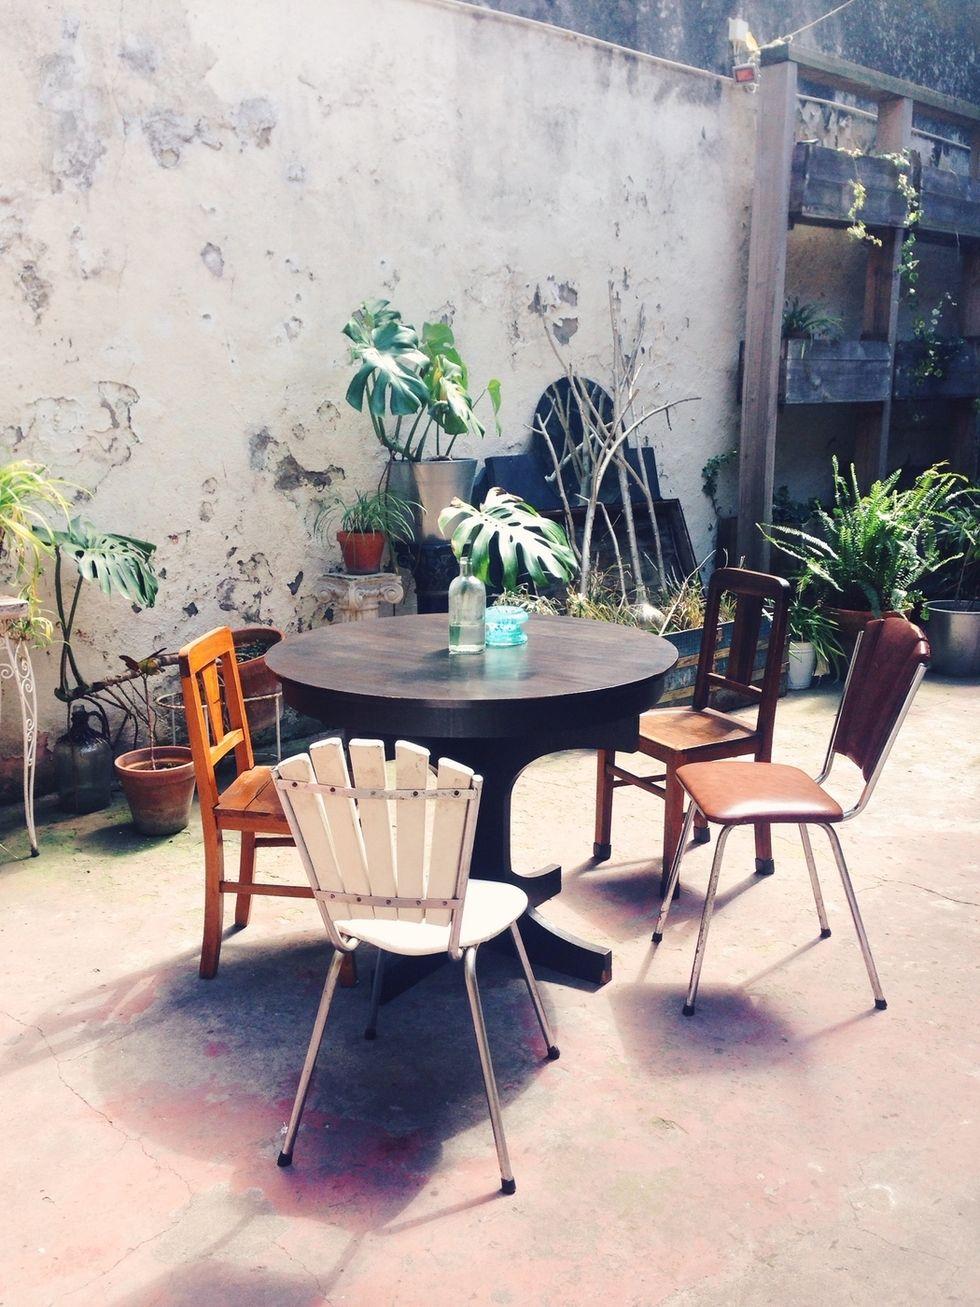 Casa Independente - visual diary | Lily.fi